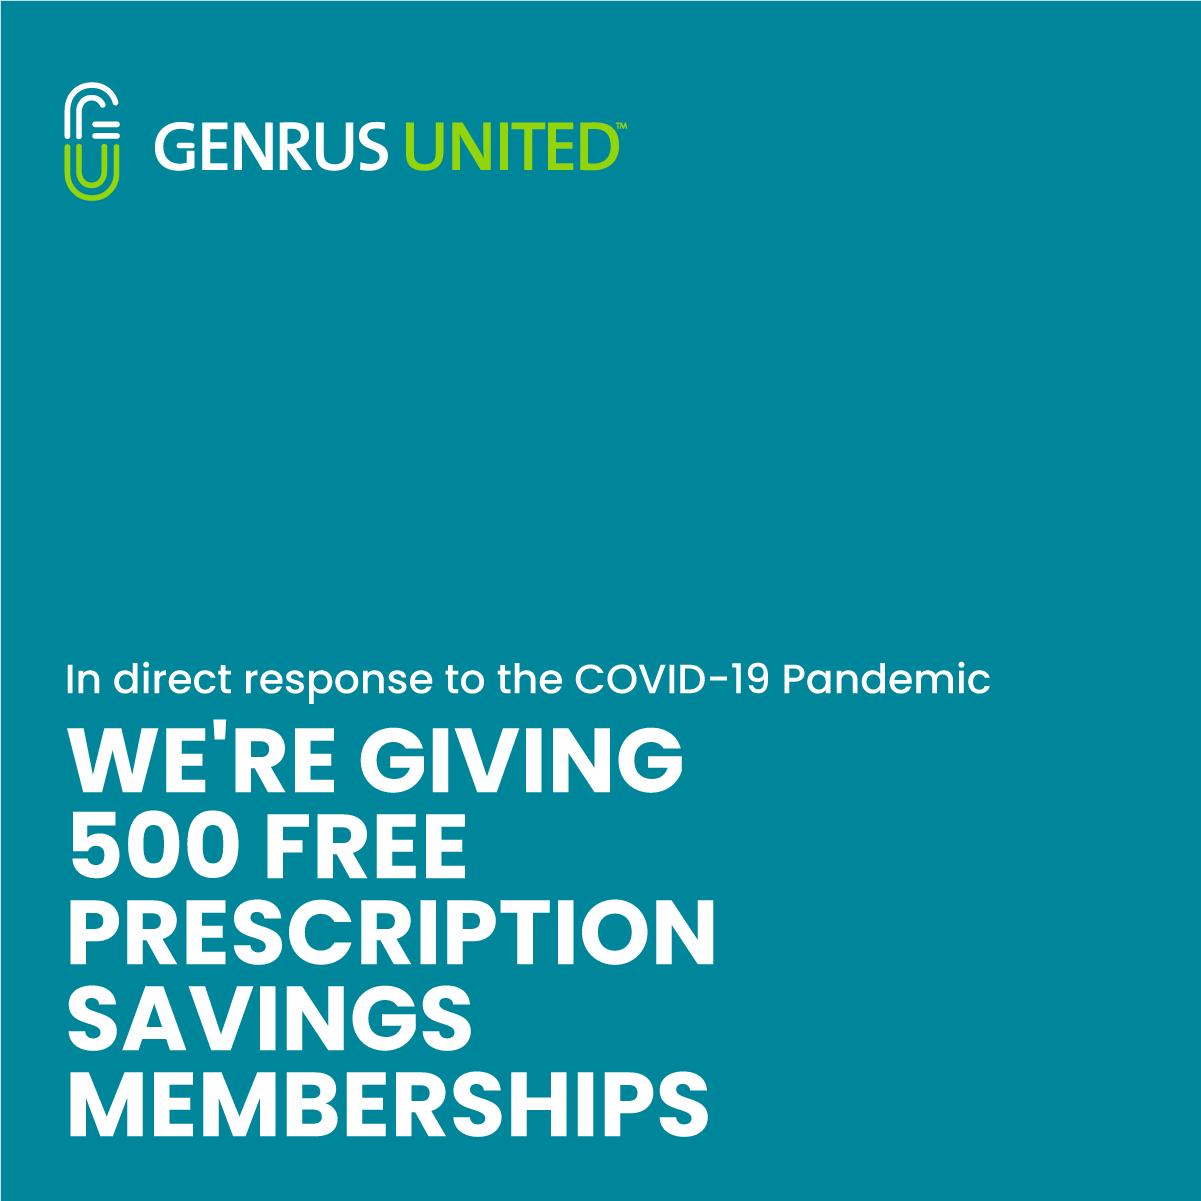 Genrus United 500 Free Membership posters